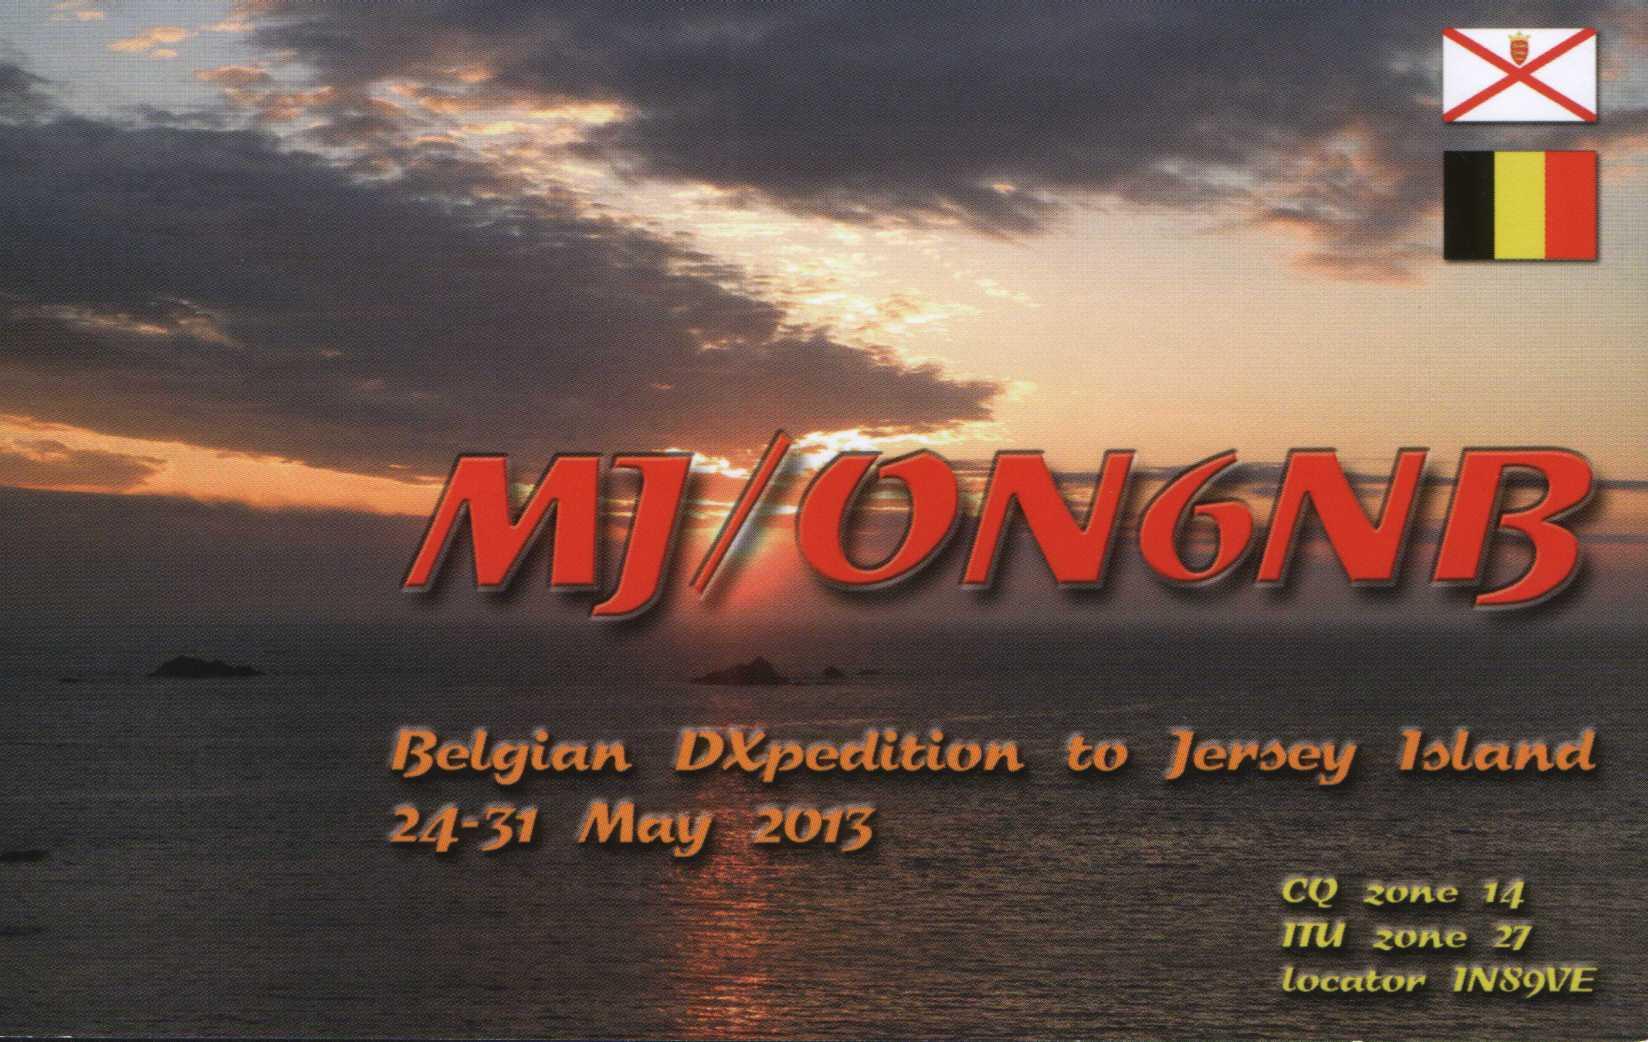 imagizer.imageshack.us/v2/xq90/841/9mrh.jpg